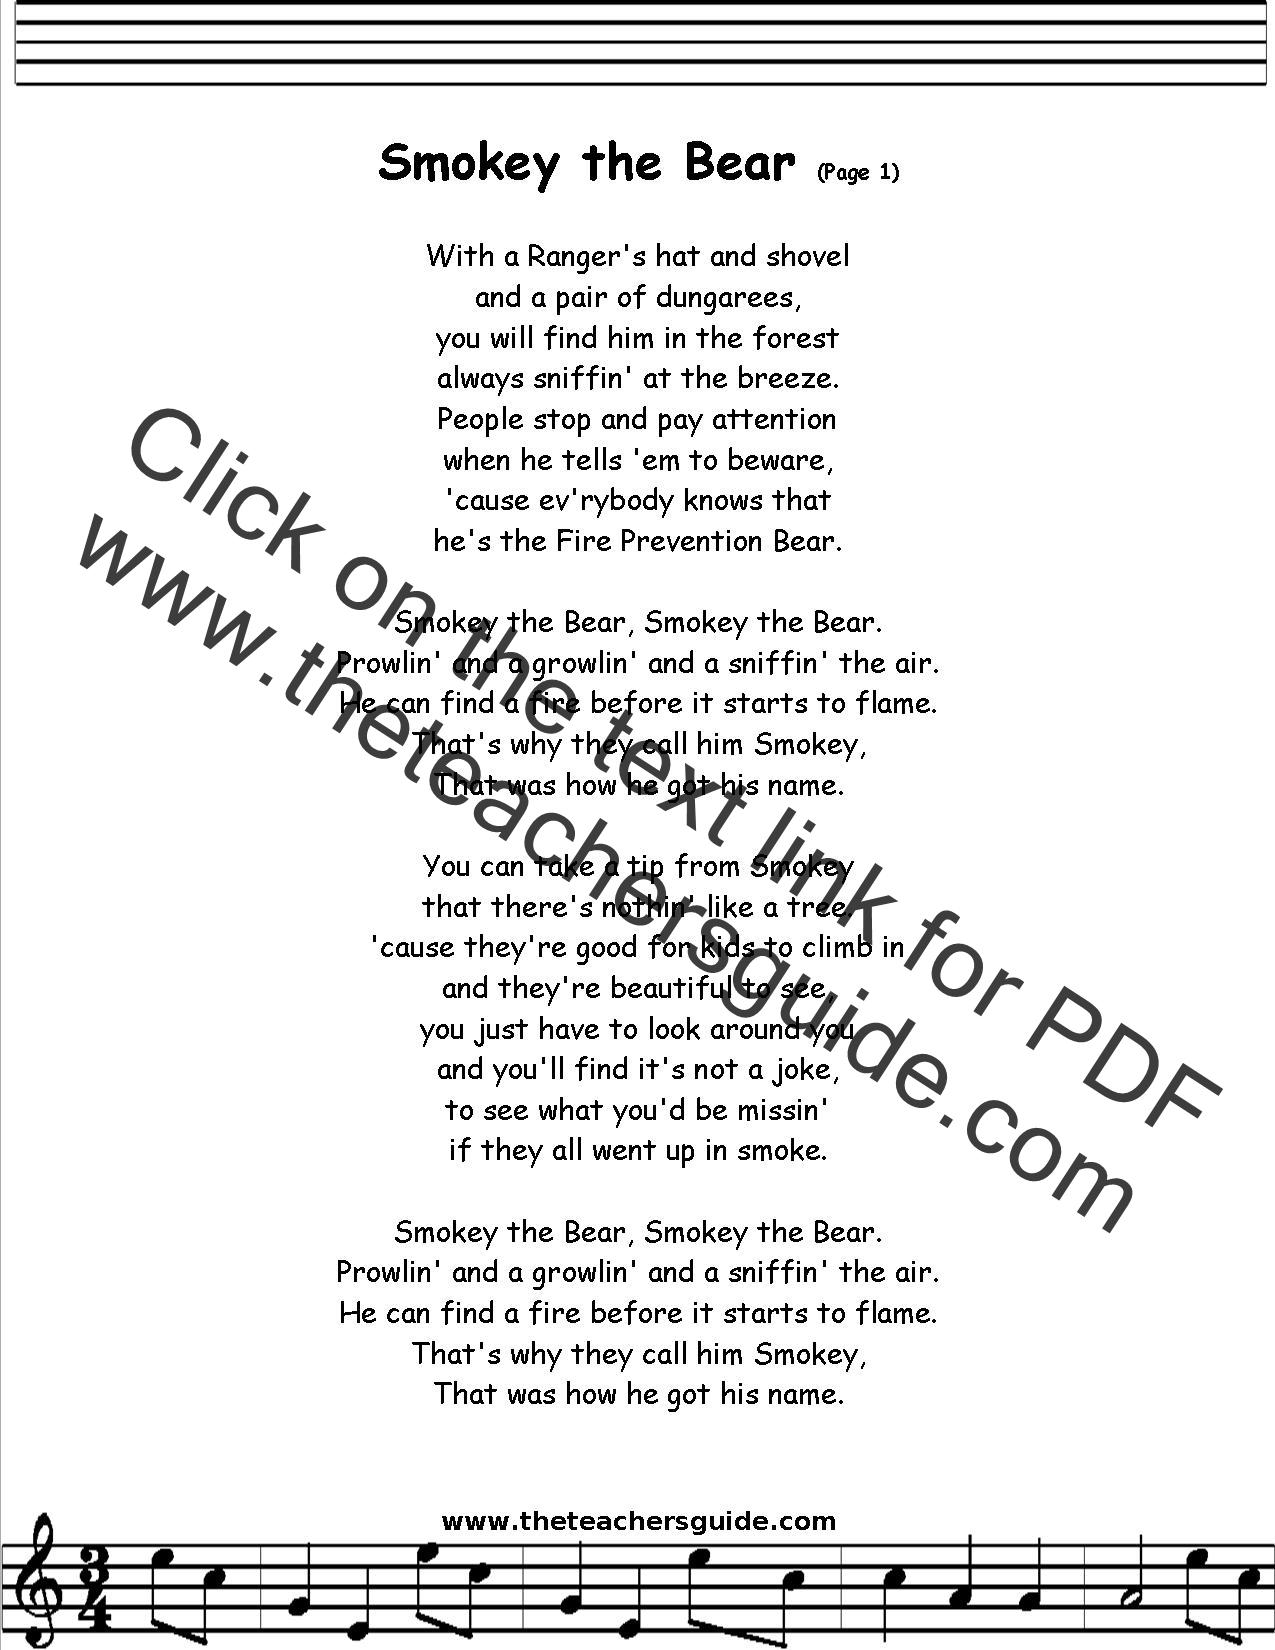 Smokey The Bear Lyrics Printout Midi And Video